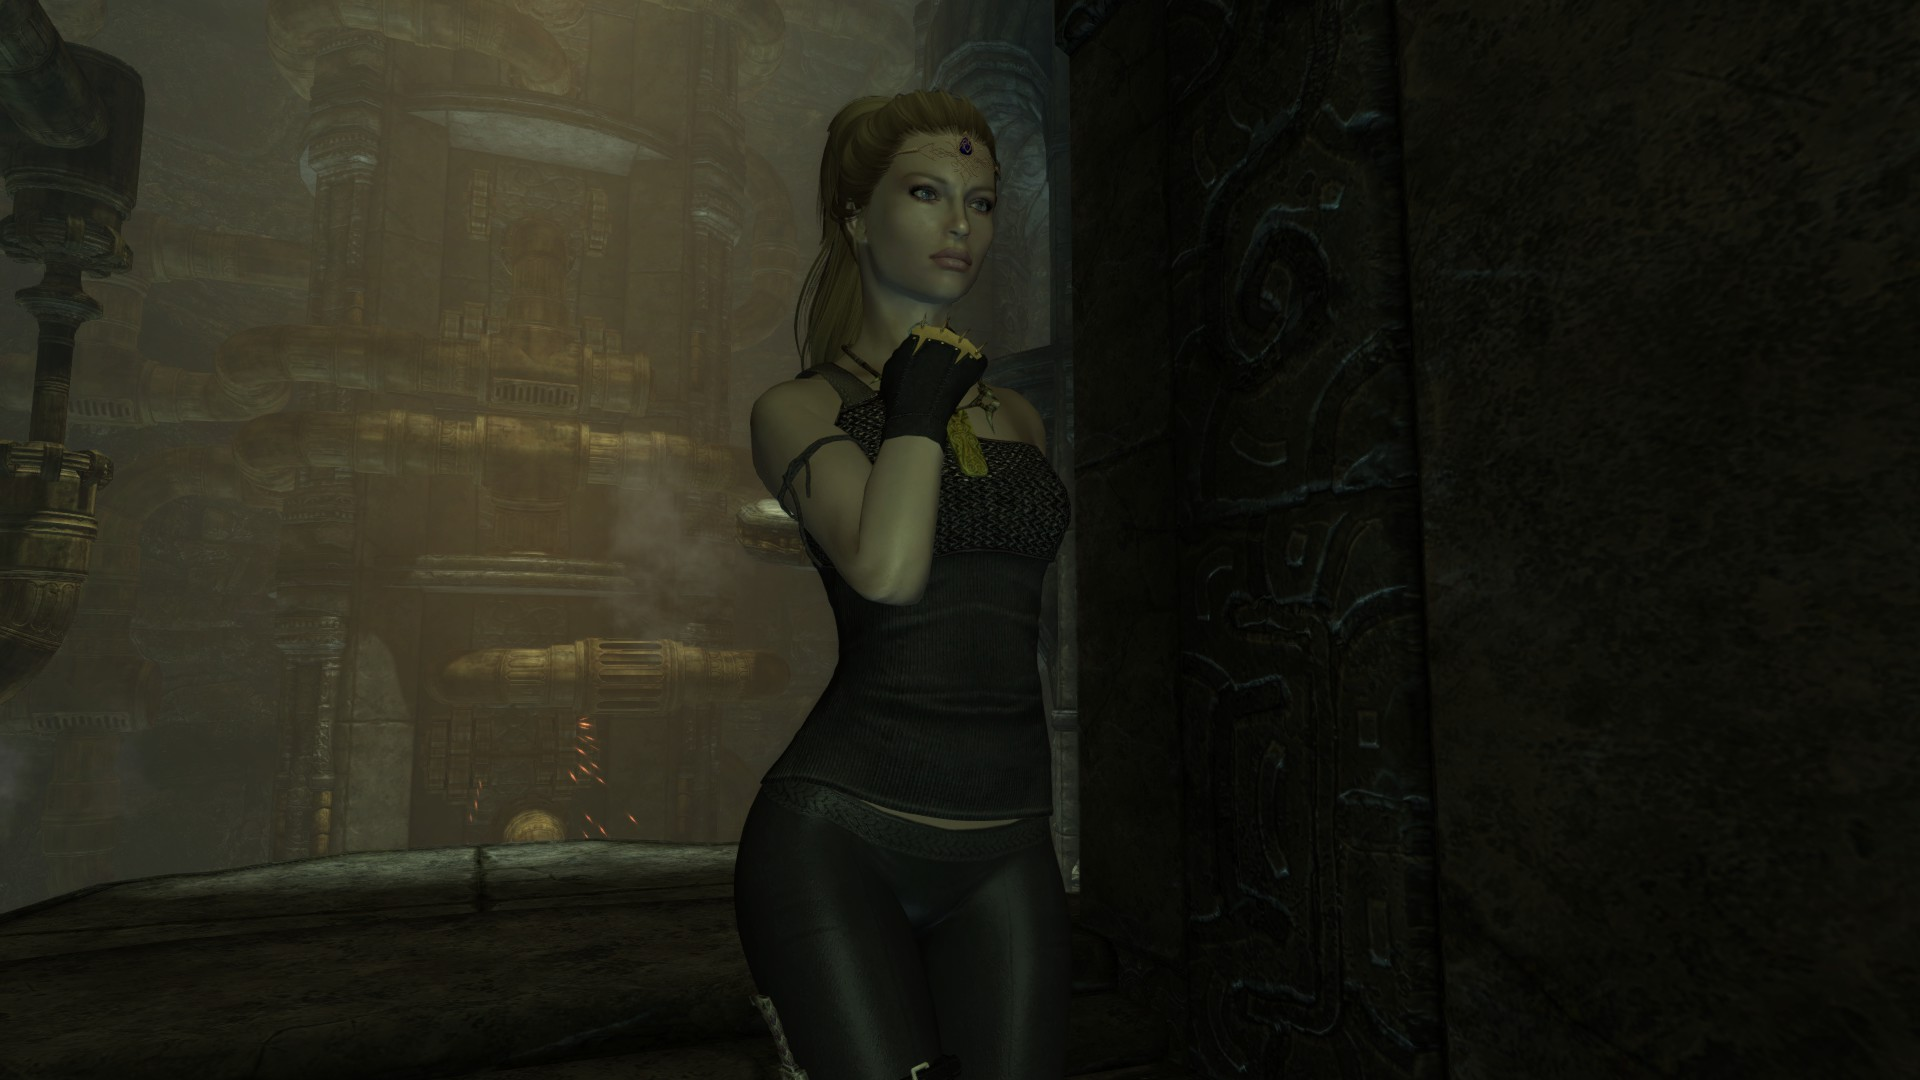 20180721191839_1.jpg - Elder Scrolls 5: Skyrim, the